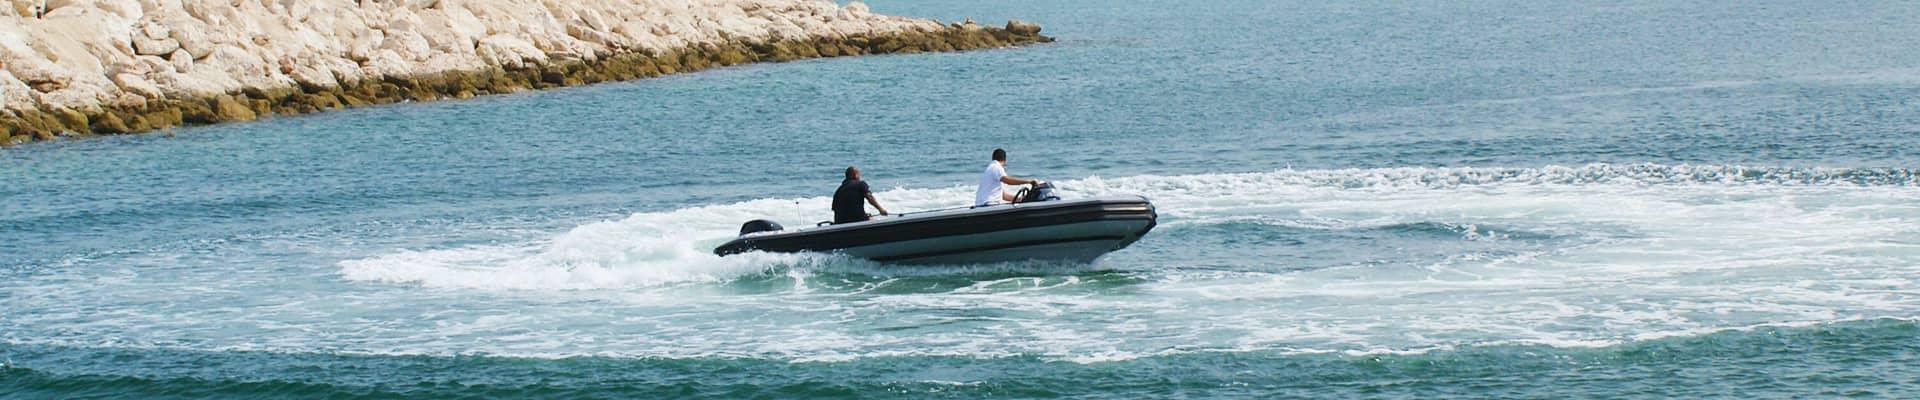 Rigid-Inflatable-Boats-RIBs-Navy